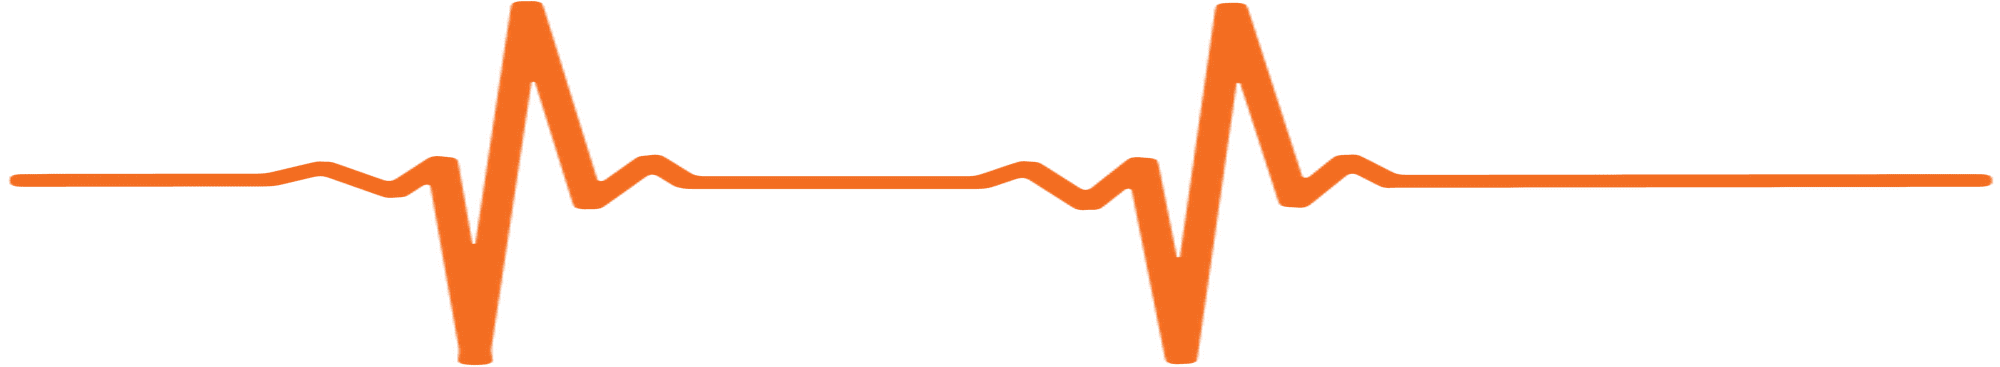 pulse-icon_orange